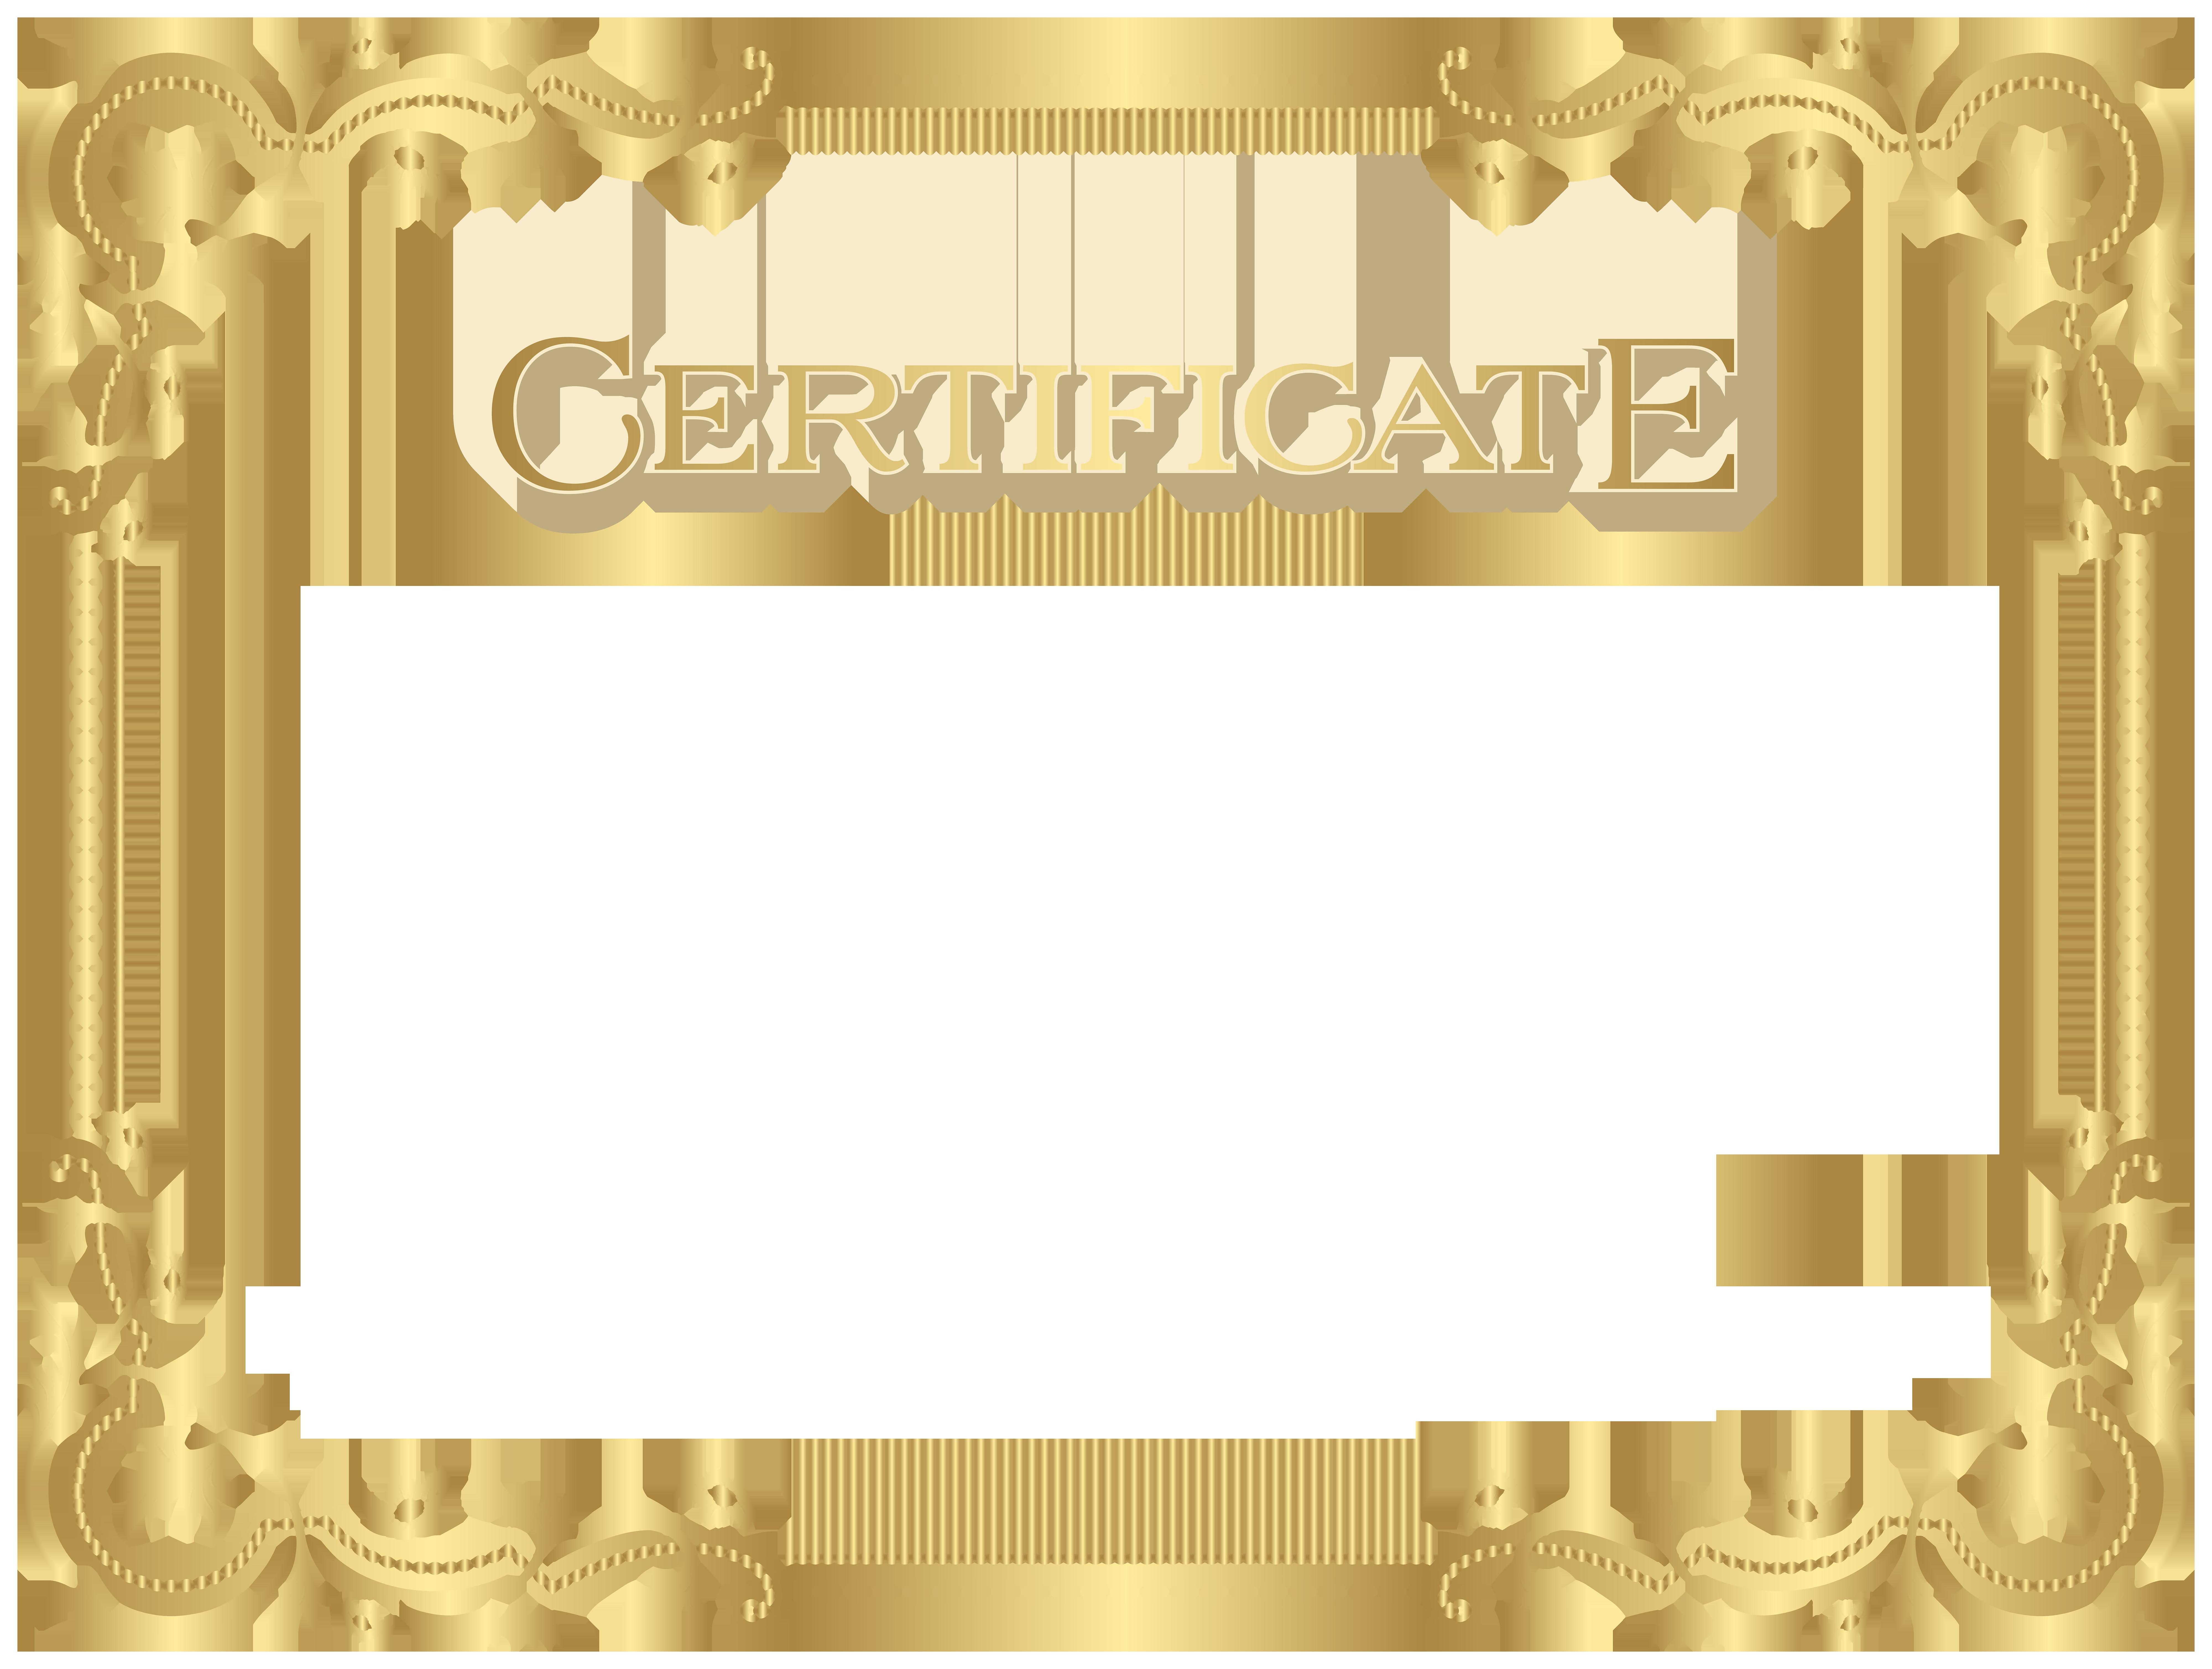 Transparent Certificate Template Clip Art Image.